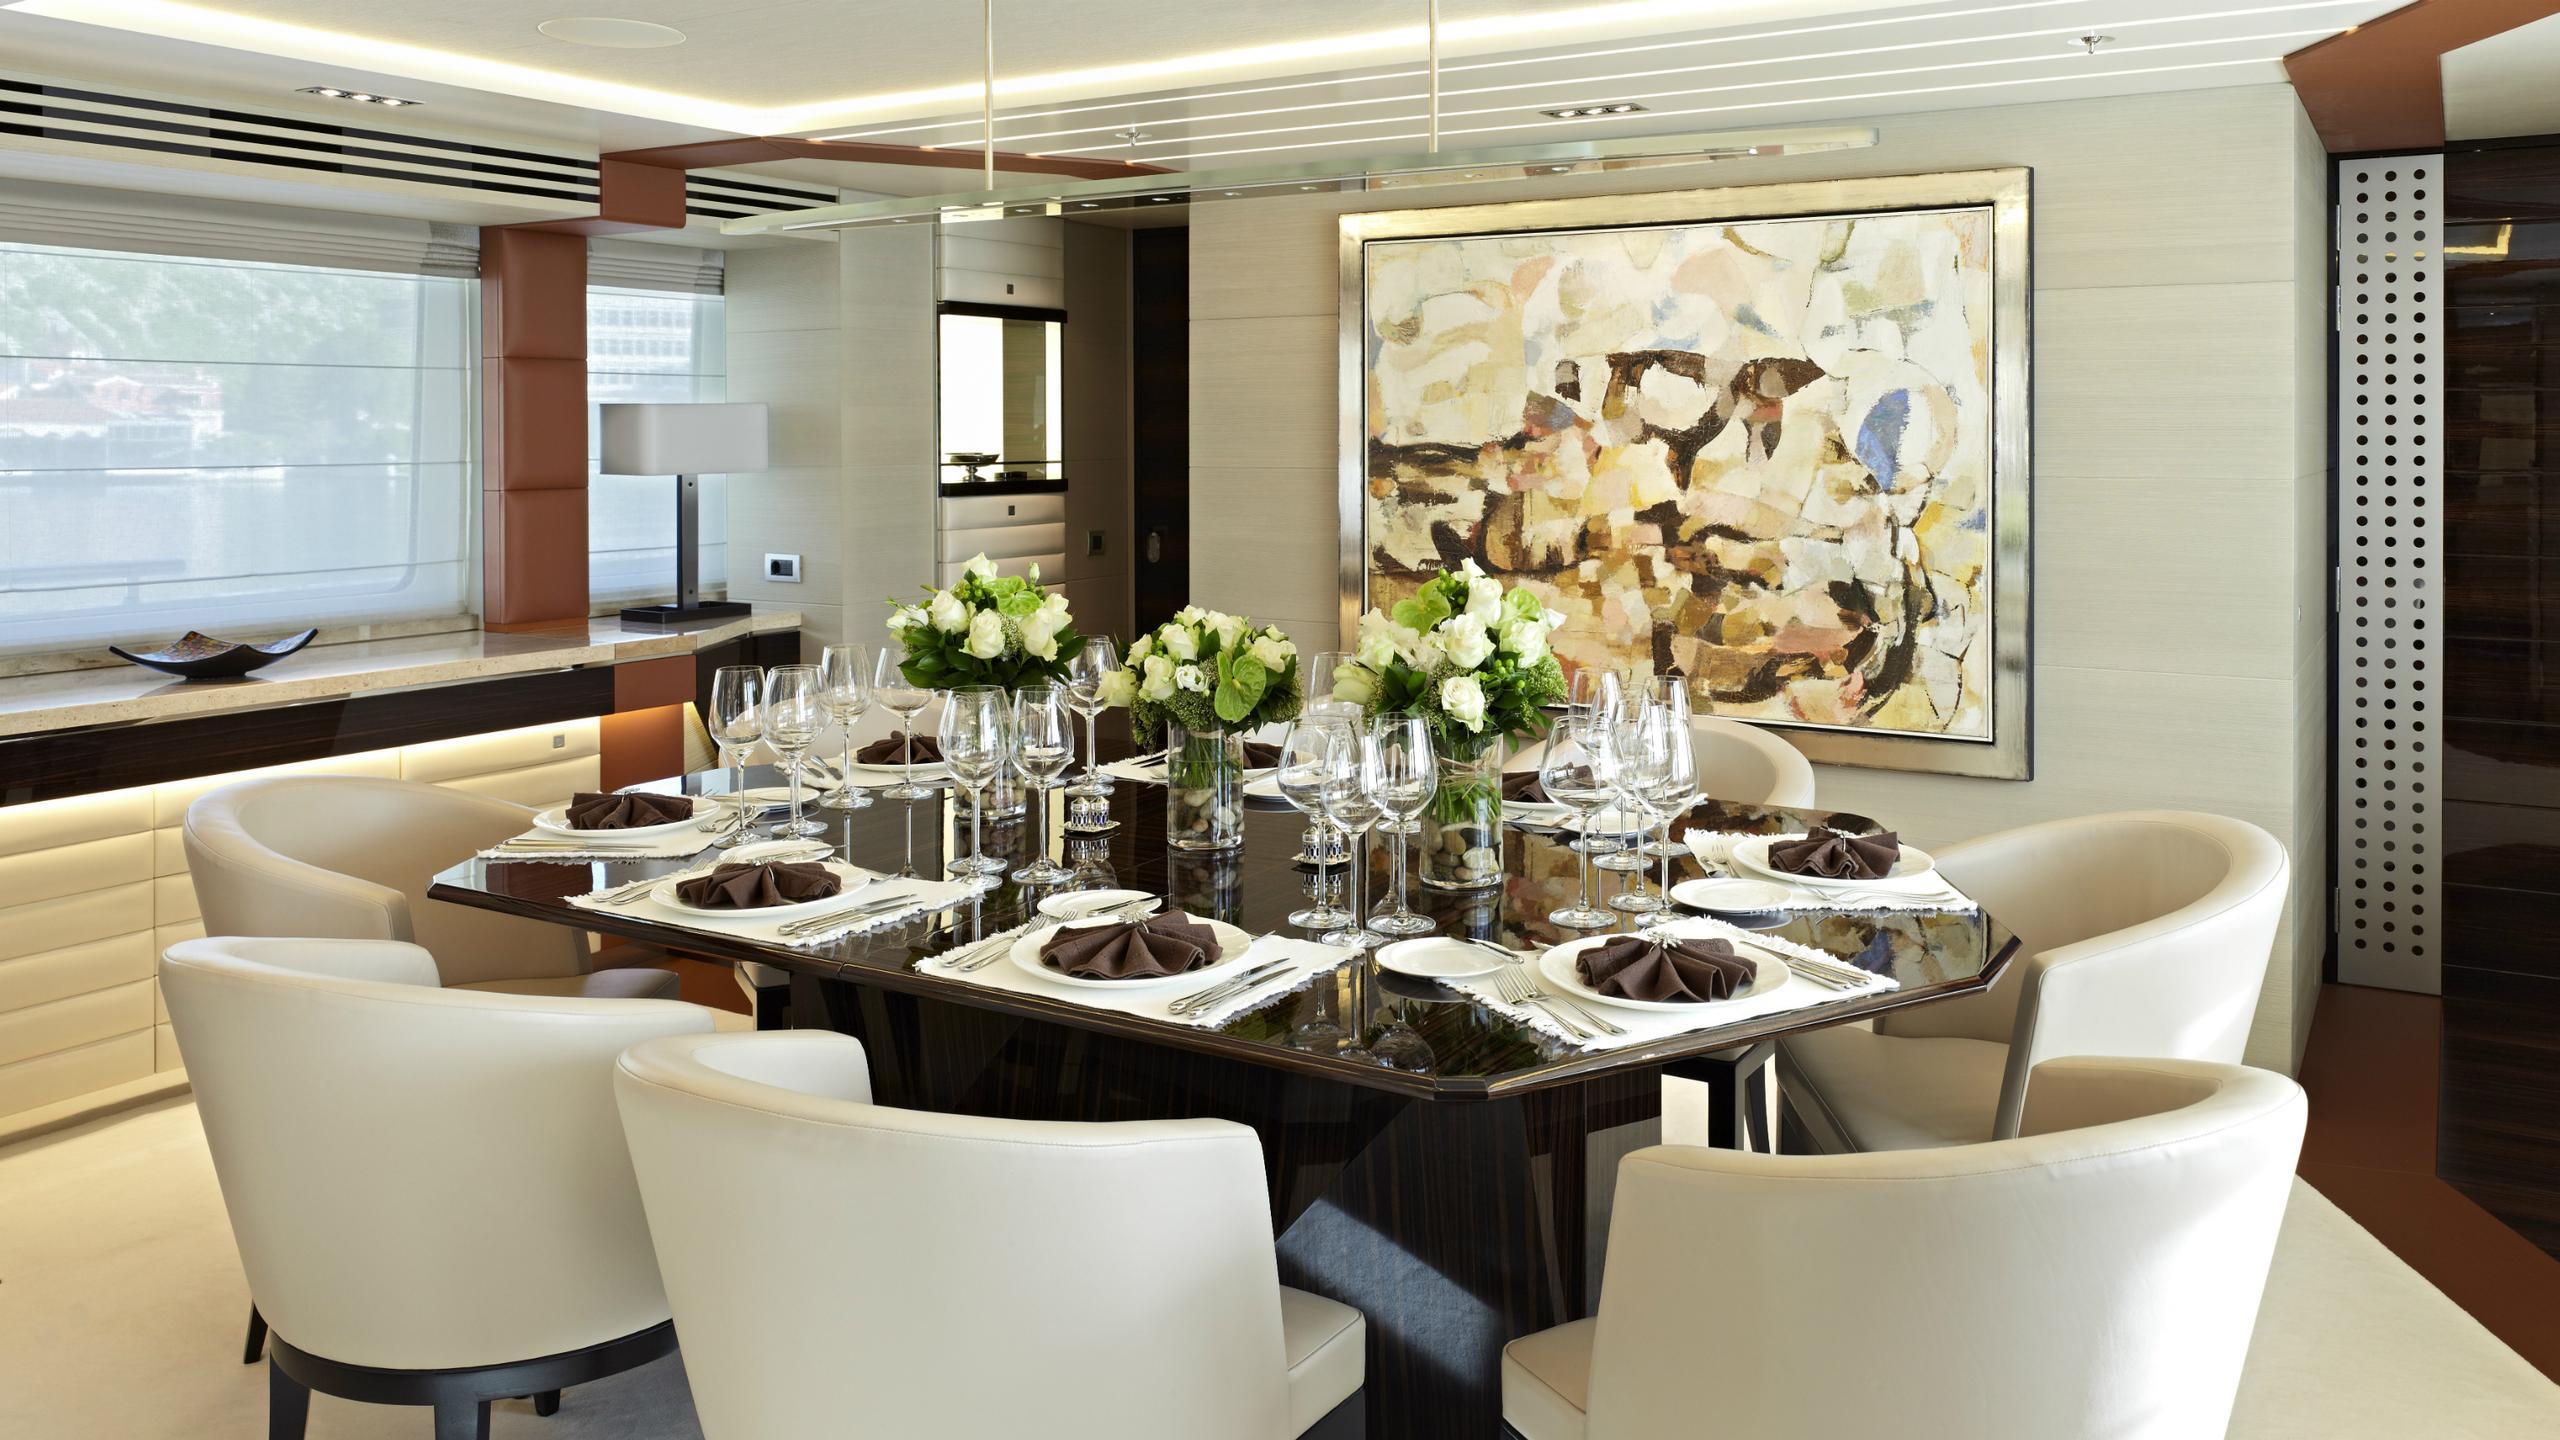 odyssea-como-lady-petra-motor-yacht-heesen-2012-47m-dining-room